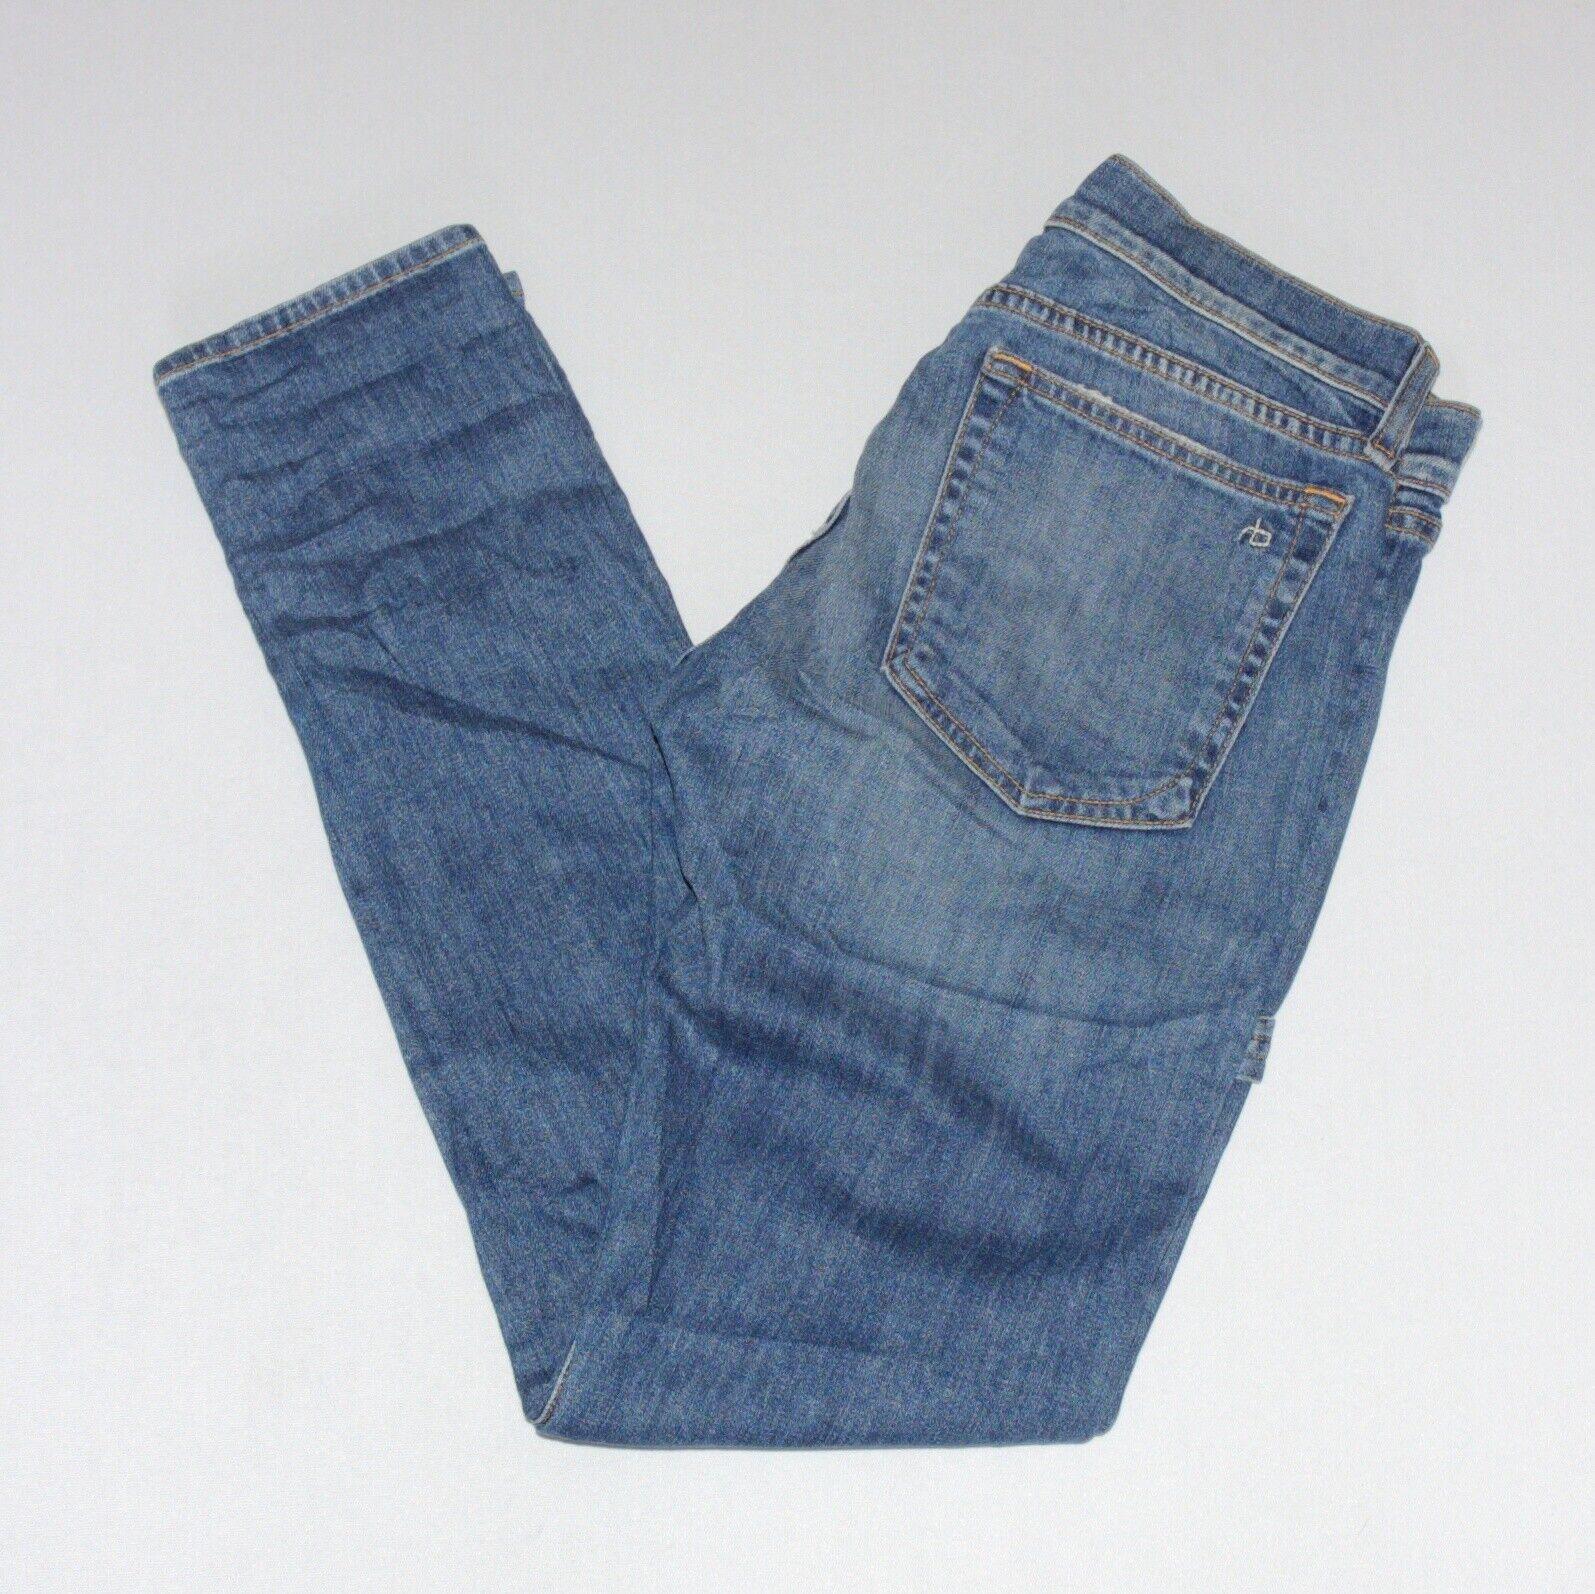 Rag & Bone Dre Carpenter Delancy Size 25 Medium Wash Distressed Jeans